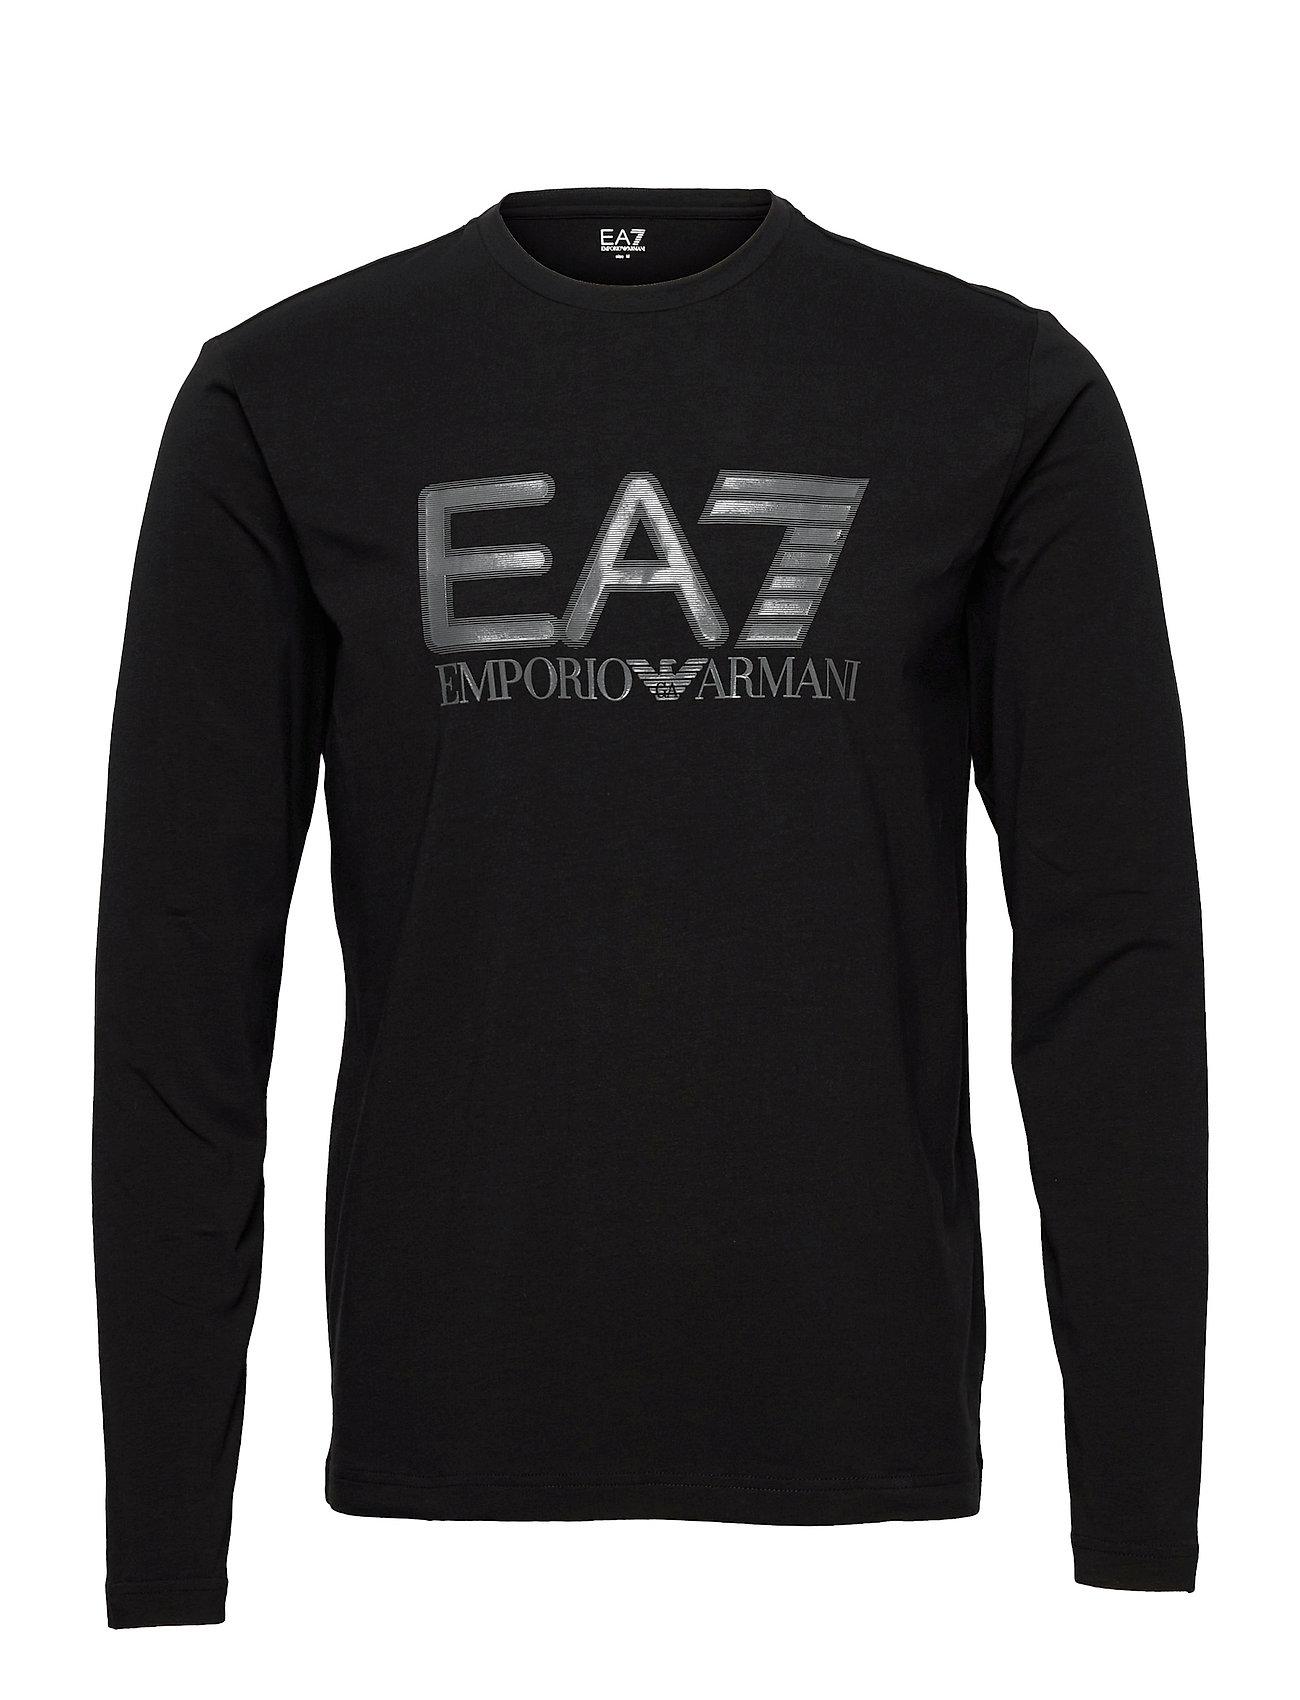 T-Shirt T-Langærmet Skjorte Sort EA7